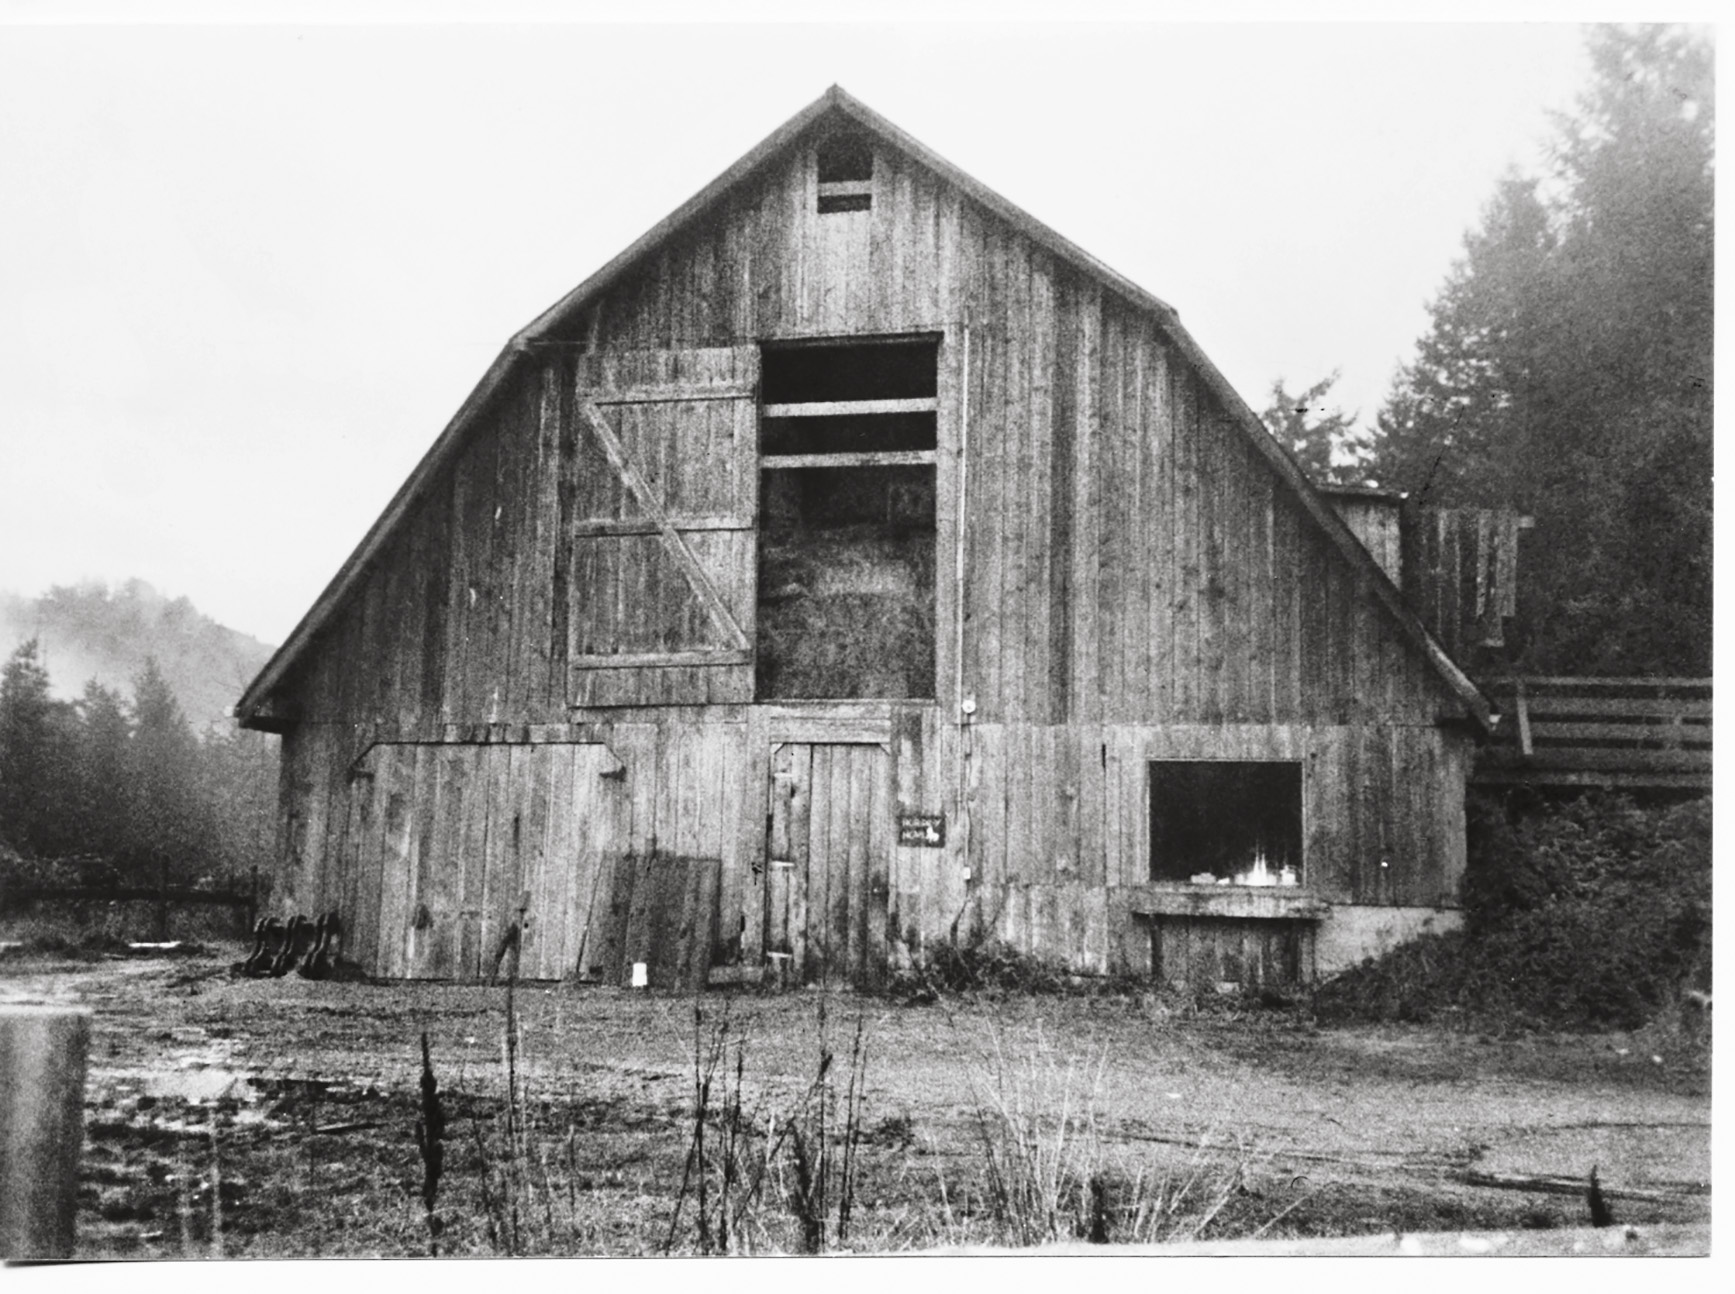 The barn stuffed full with hay.